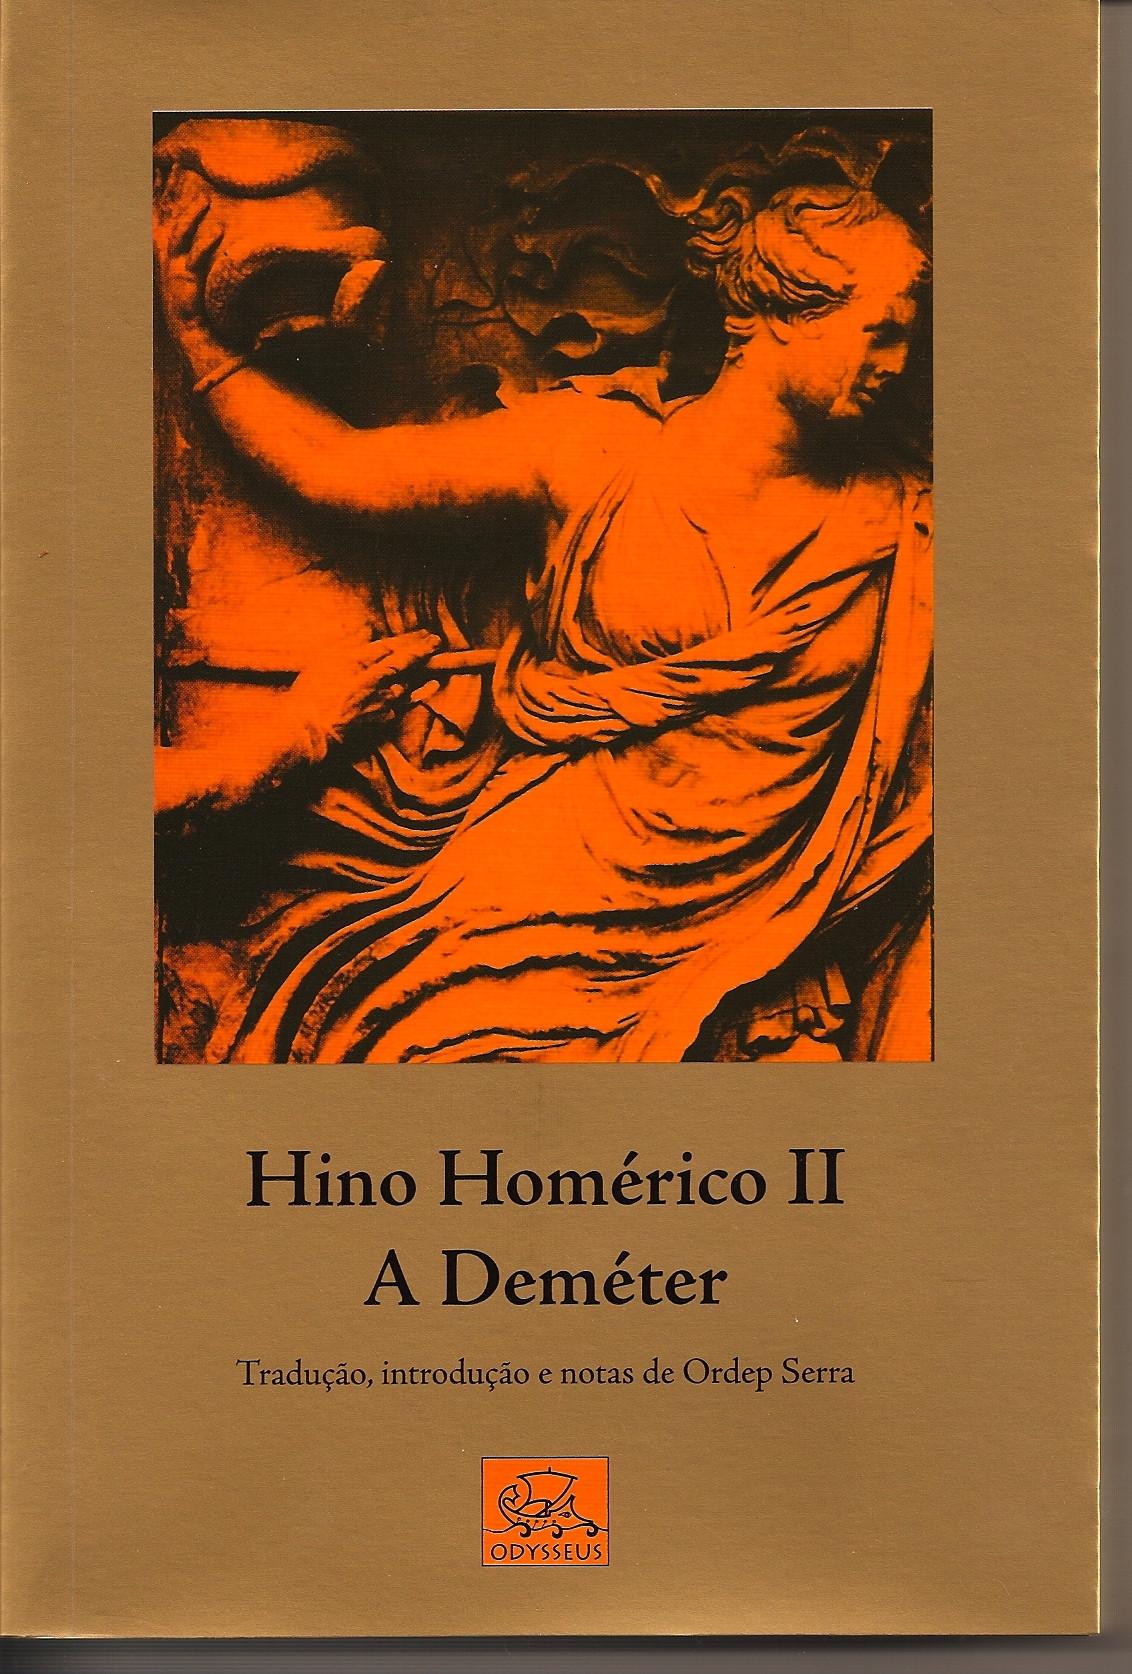 Hino Homérico II - A Deméter